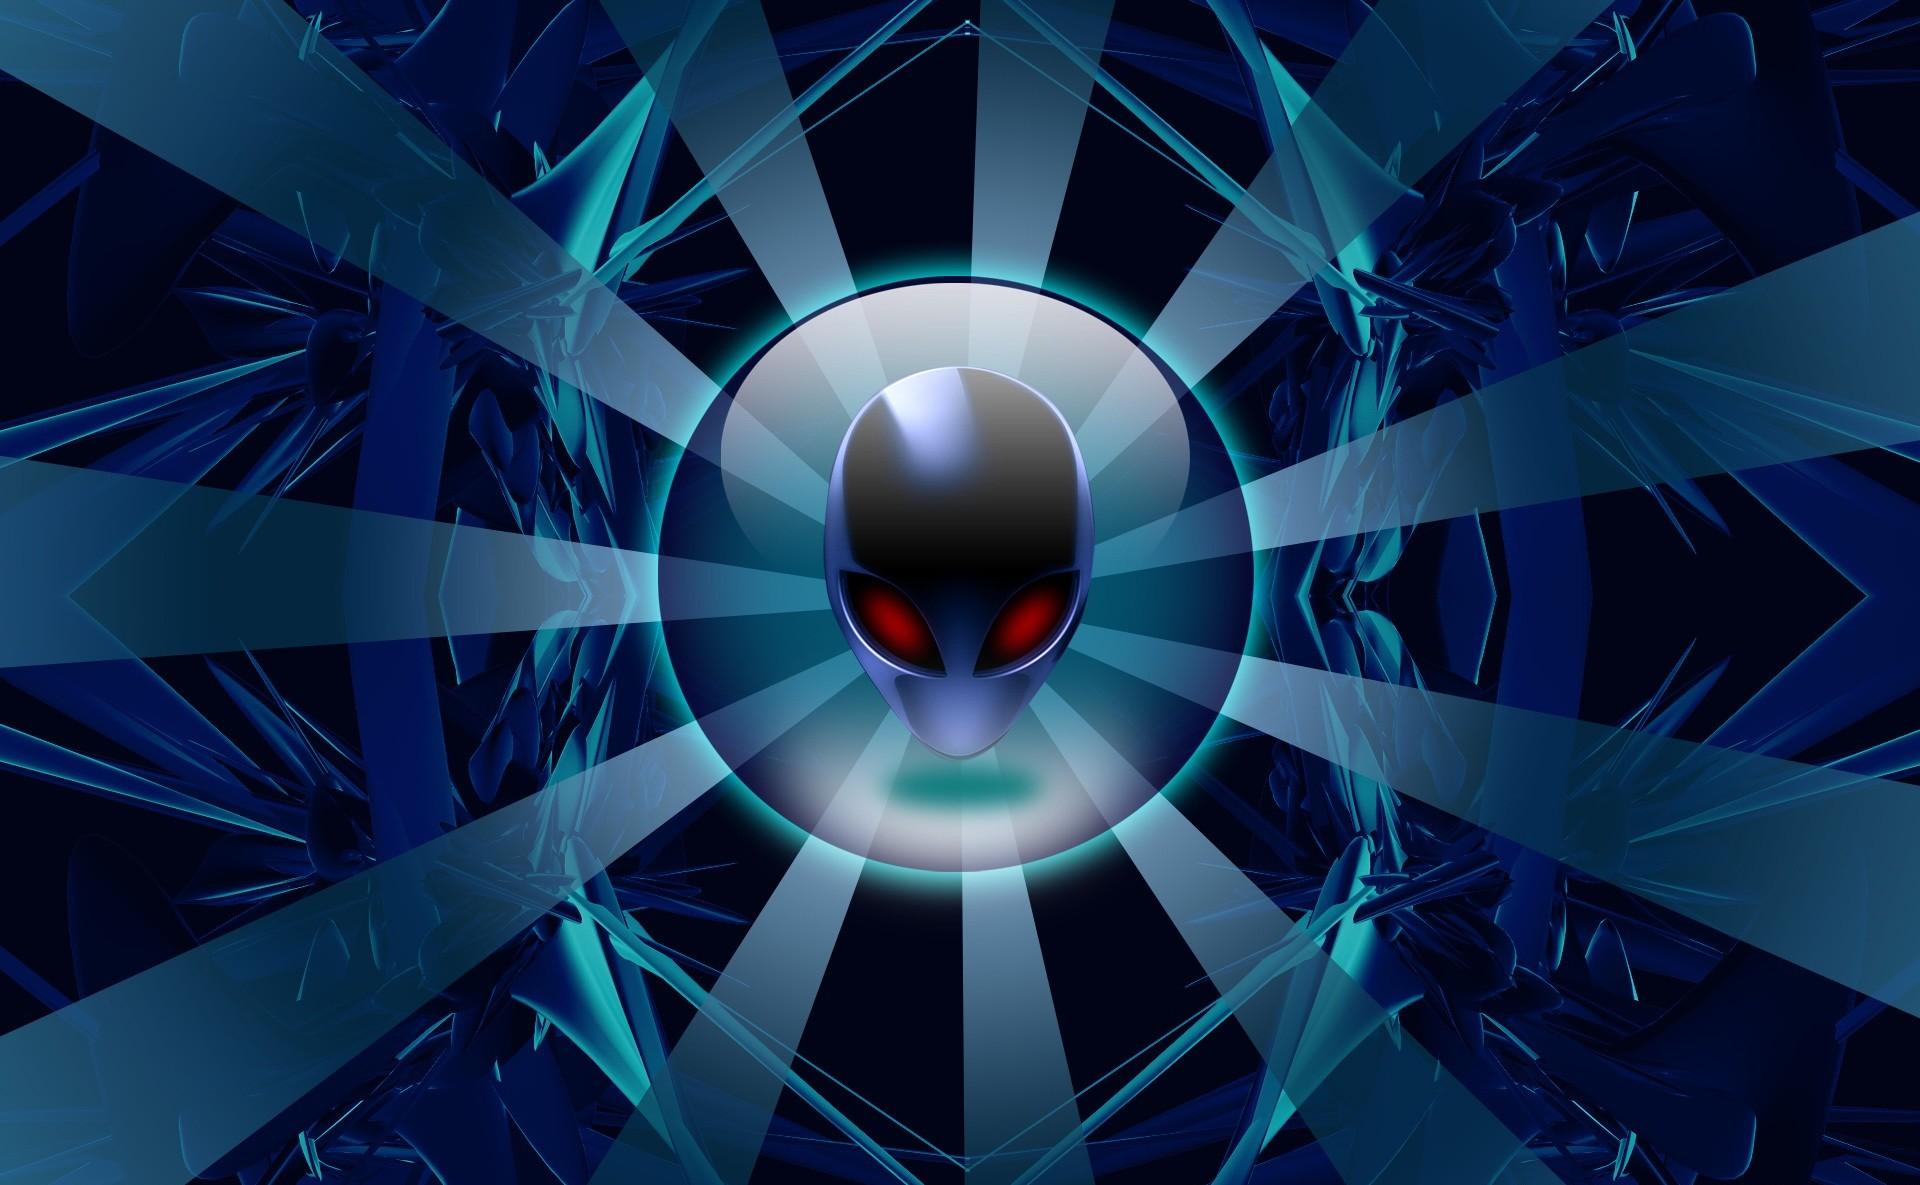 <b>Alienware</b> Moving <b>Wallpaper</b